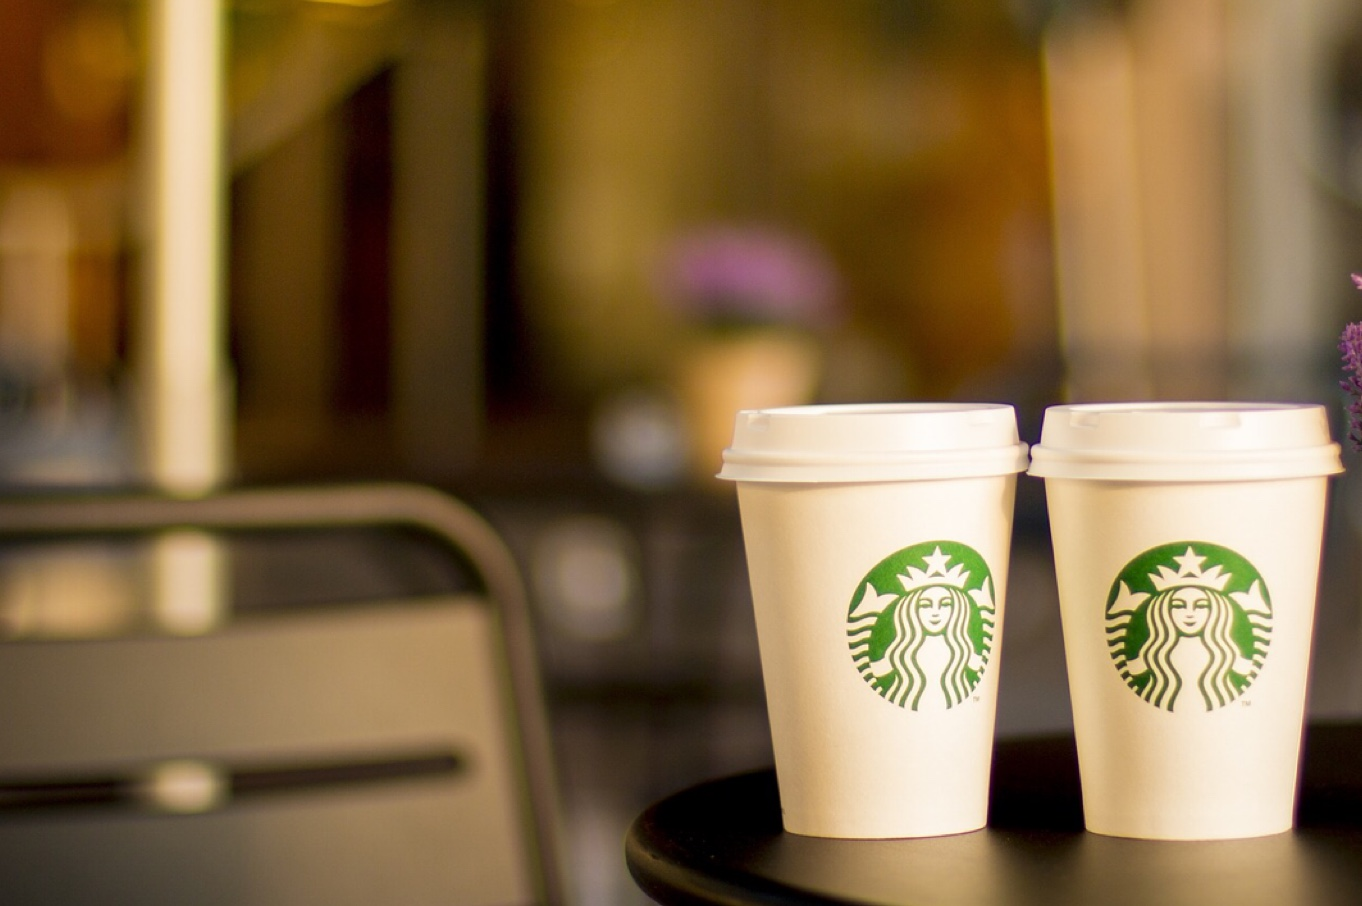 #2 – Does Jesus Love Coffee?